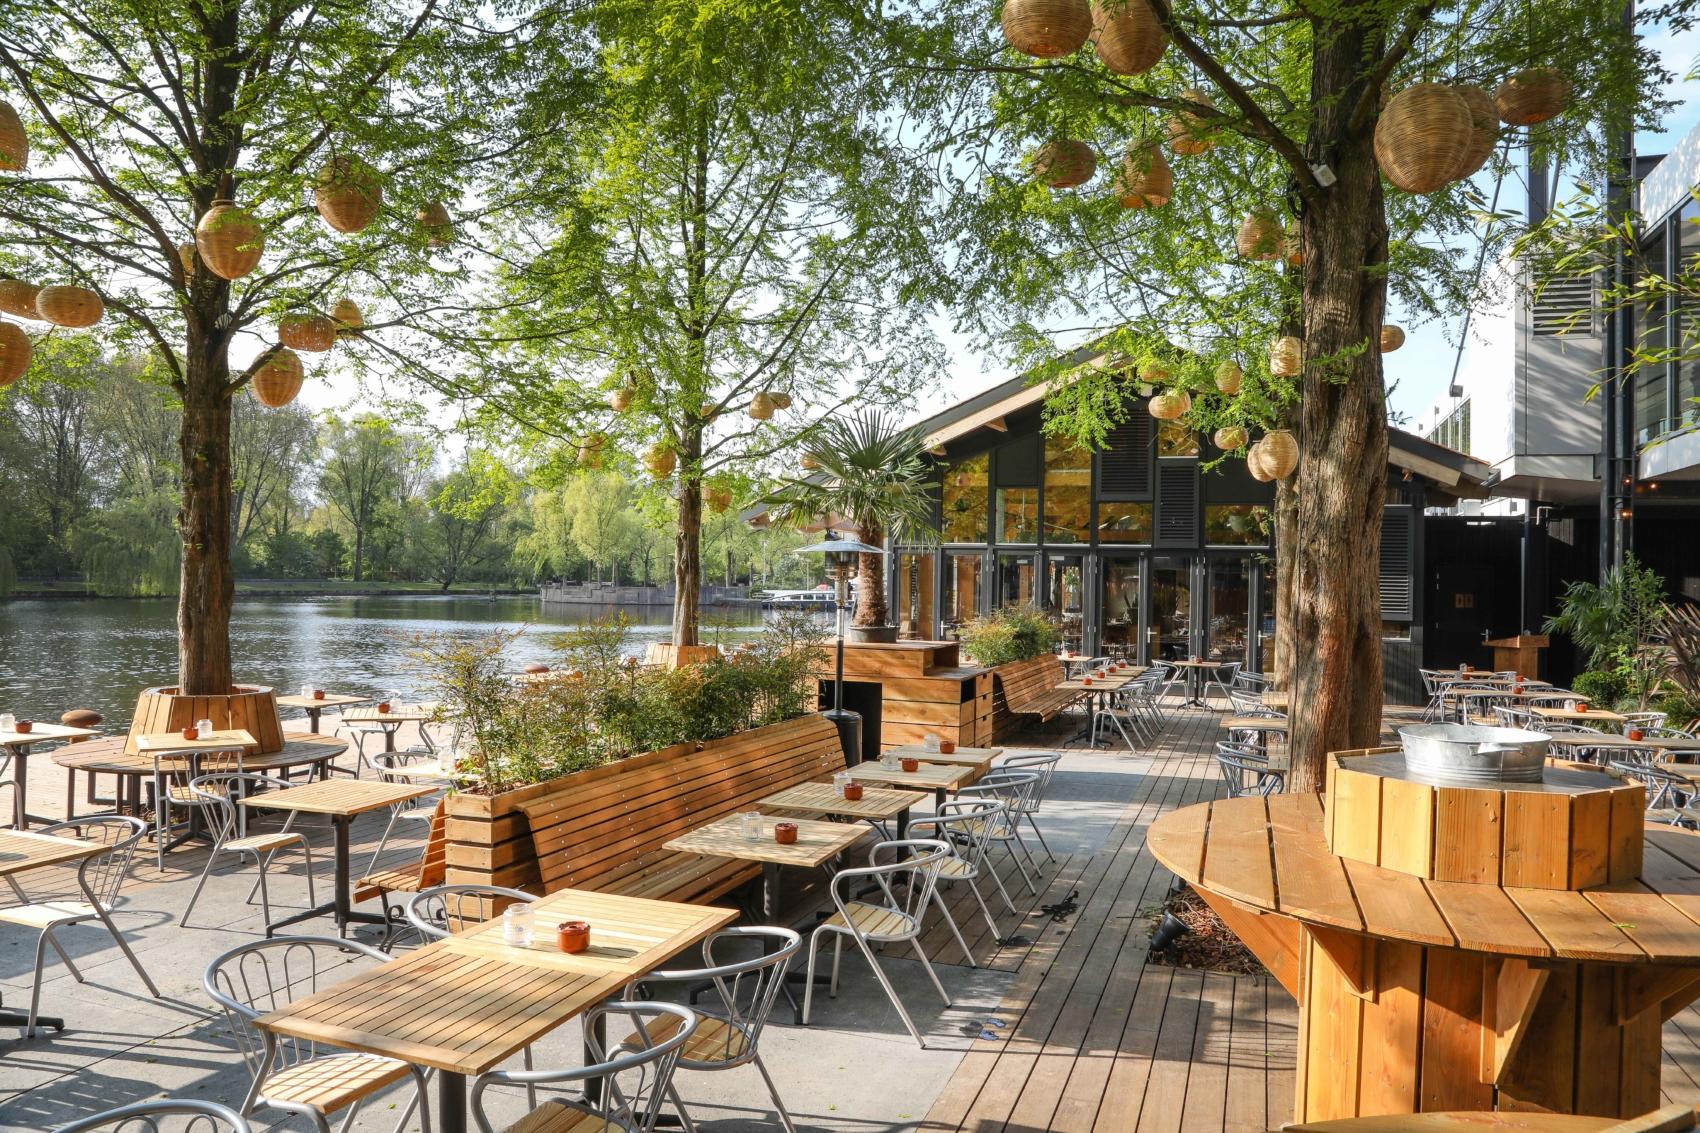 Strandzuid_restaurant_terras_groen_overdag